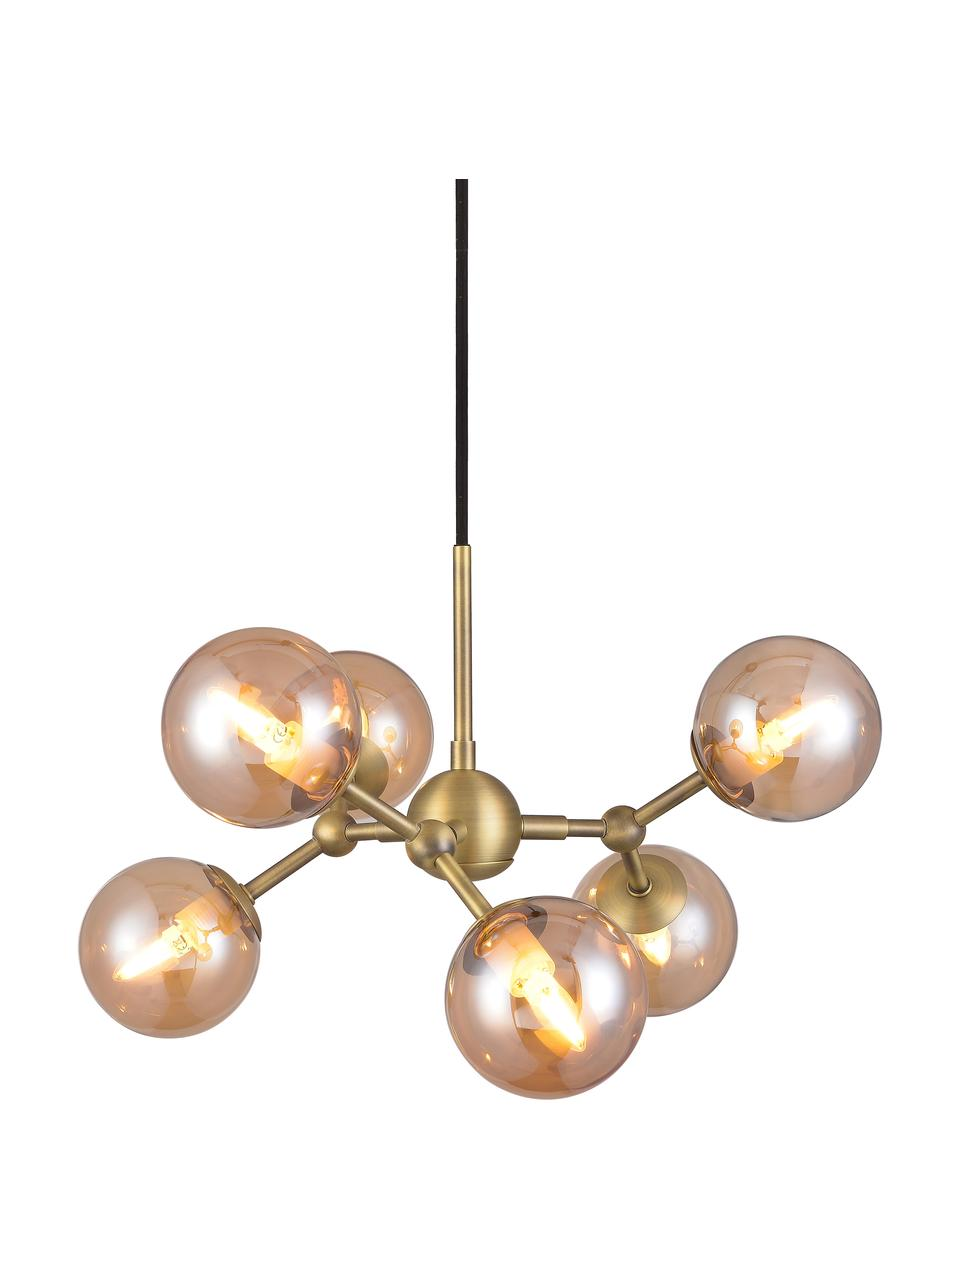 Design hanglamp Atom van glas, Lampenkap: glas, Baldakijn: kunststof, Messingkleurig, amberkleurig, Ø 45 x H 18 cm